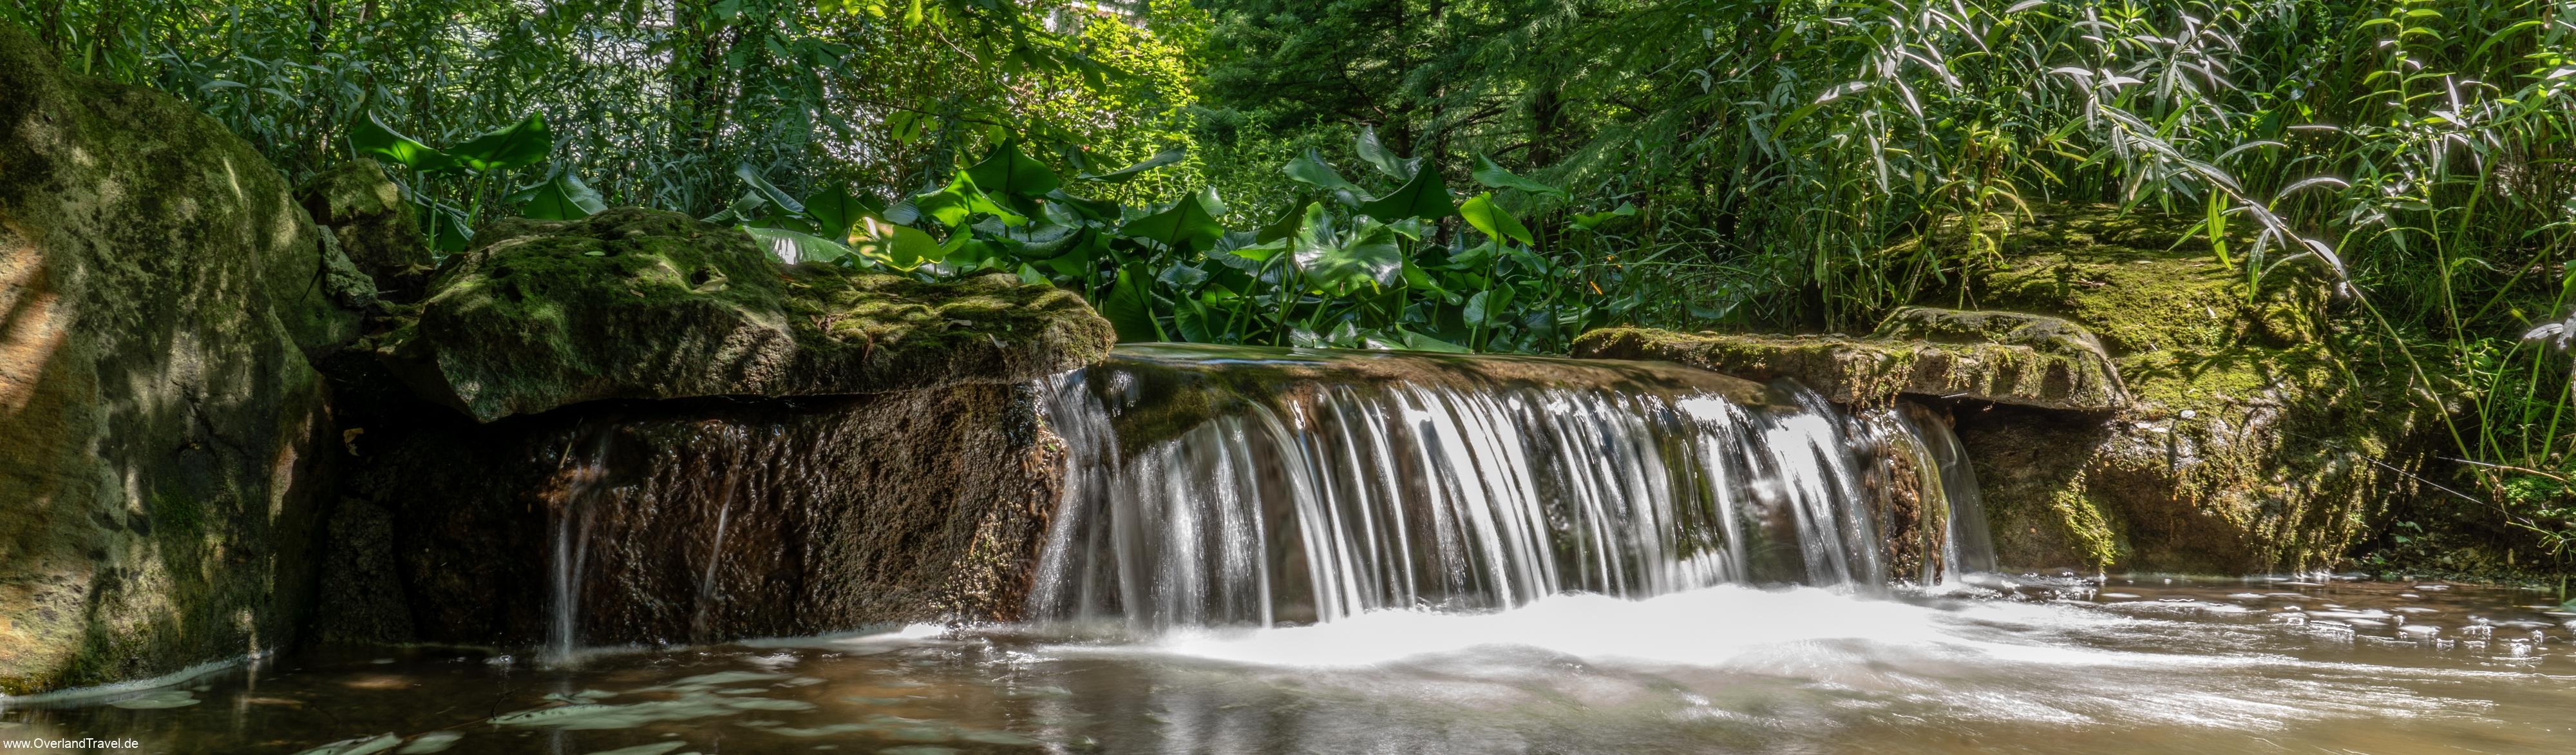 Trauttmansdorff gardens 2. place in the  International Garden Photographer of the Year 2018  Award